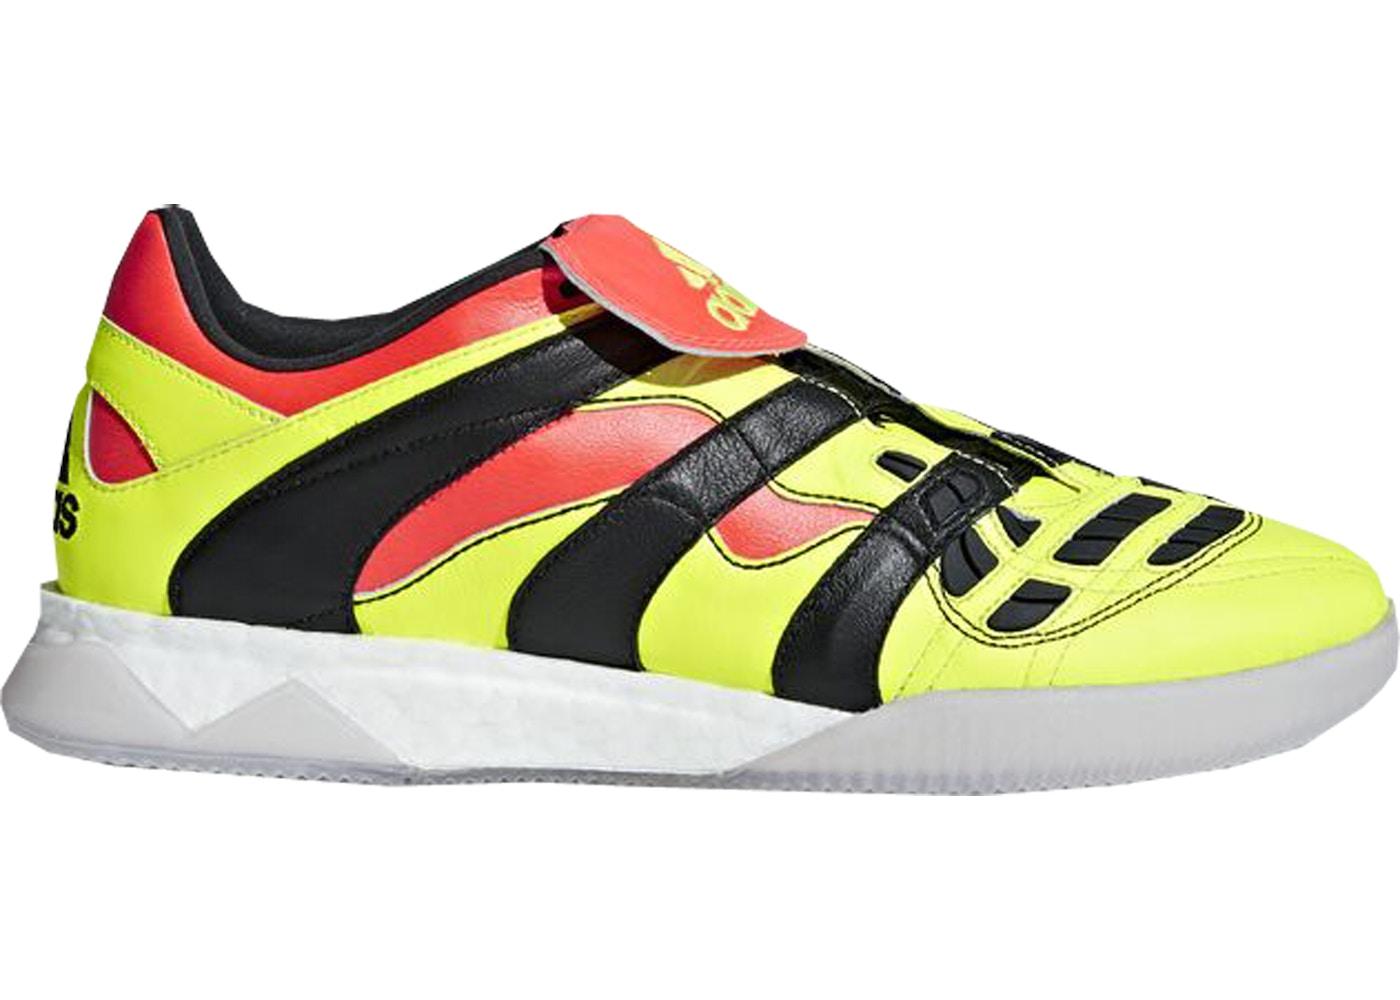 adidas predator trainers